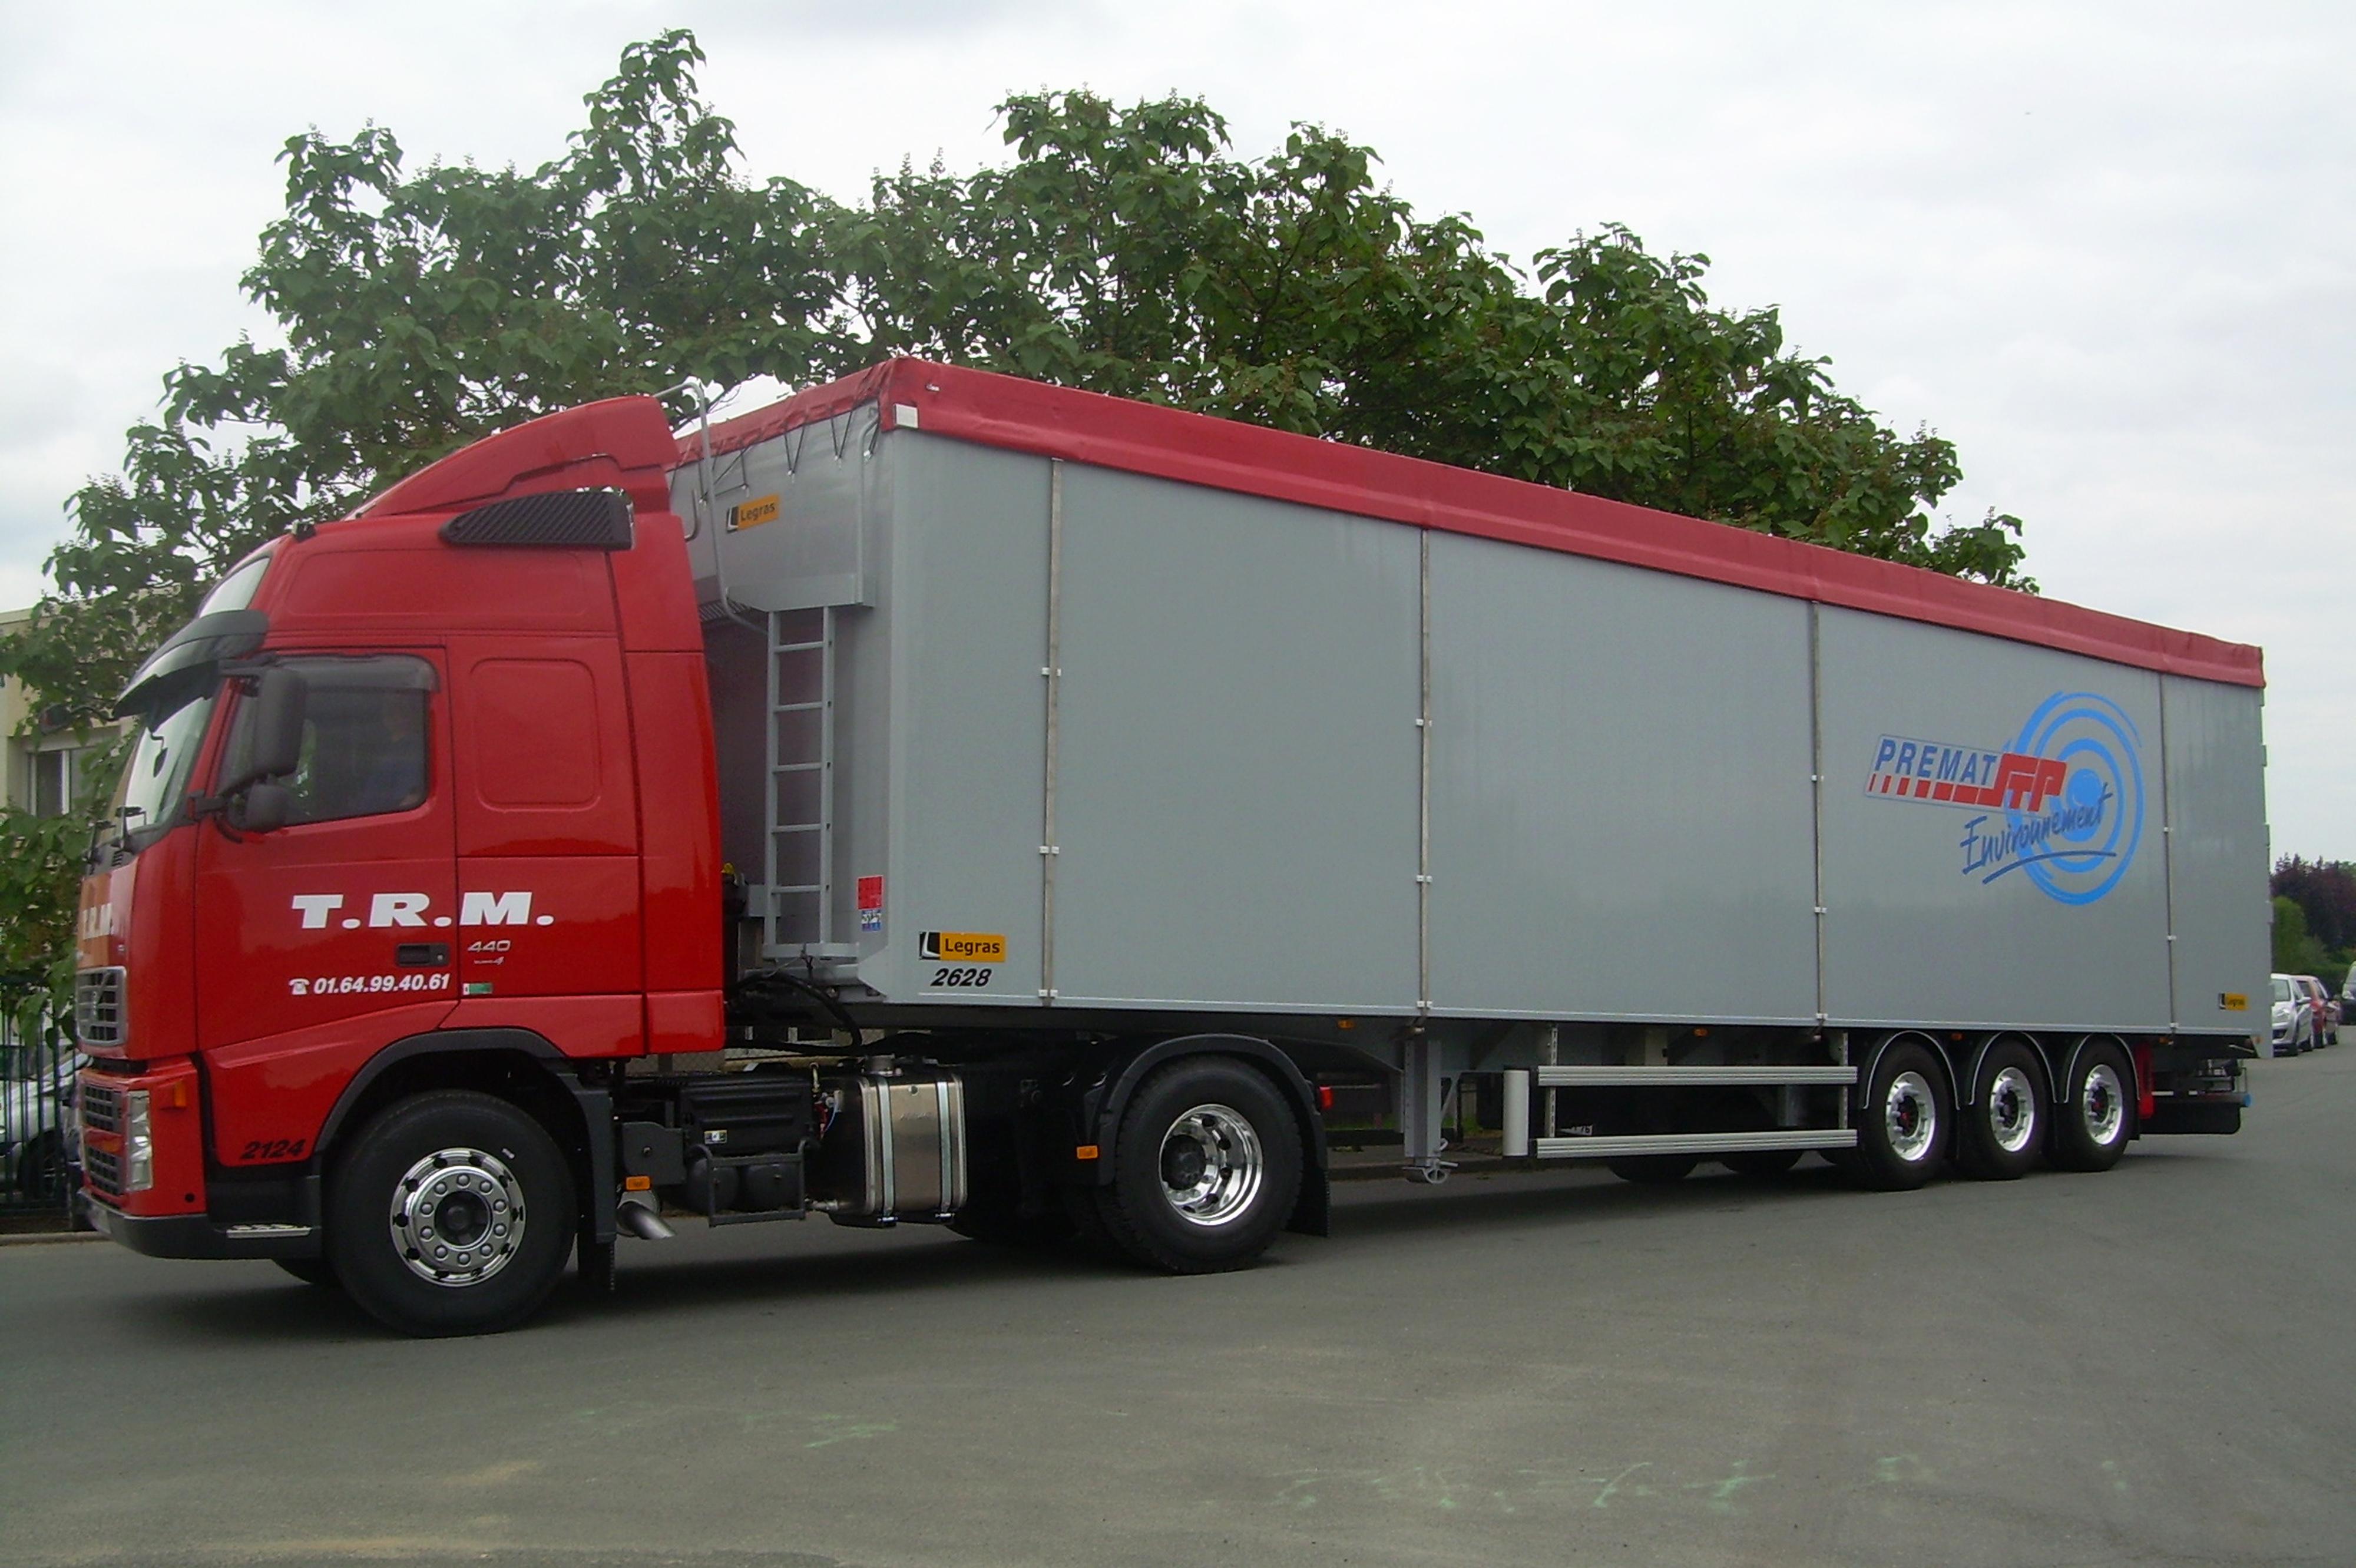 camion-environnement